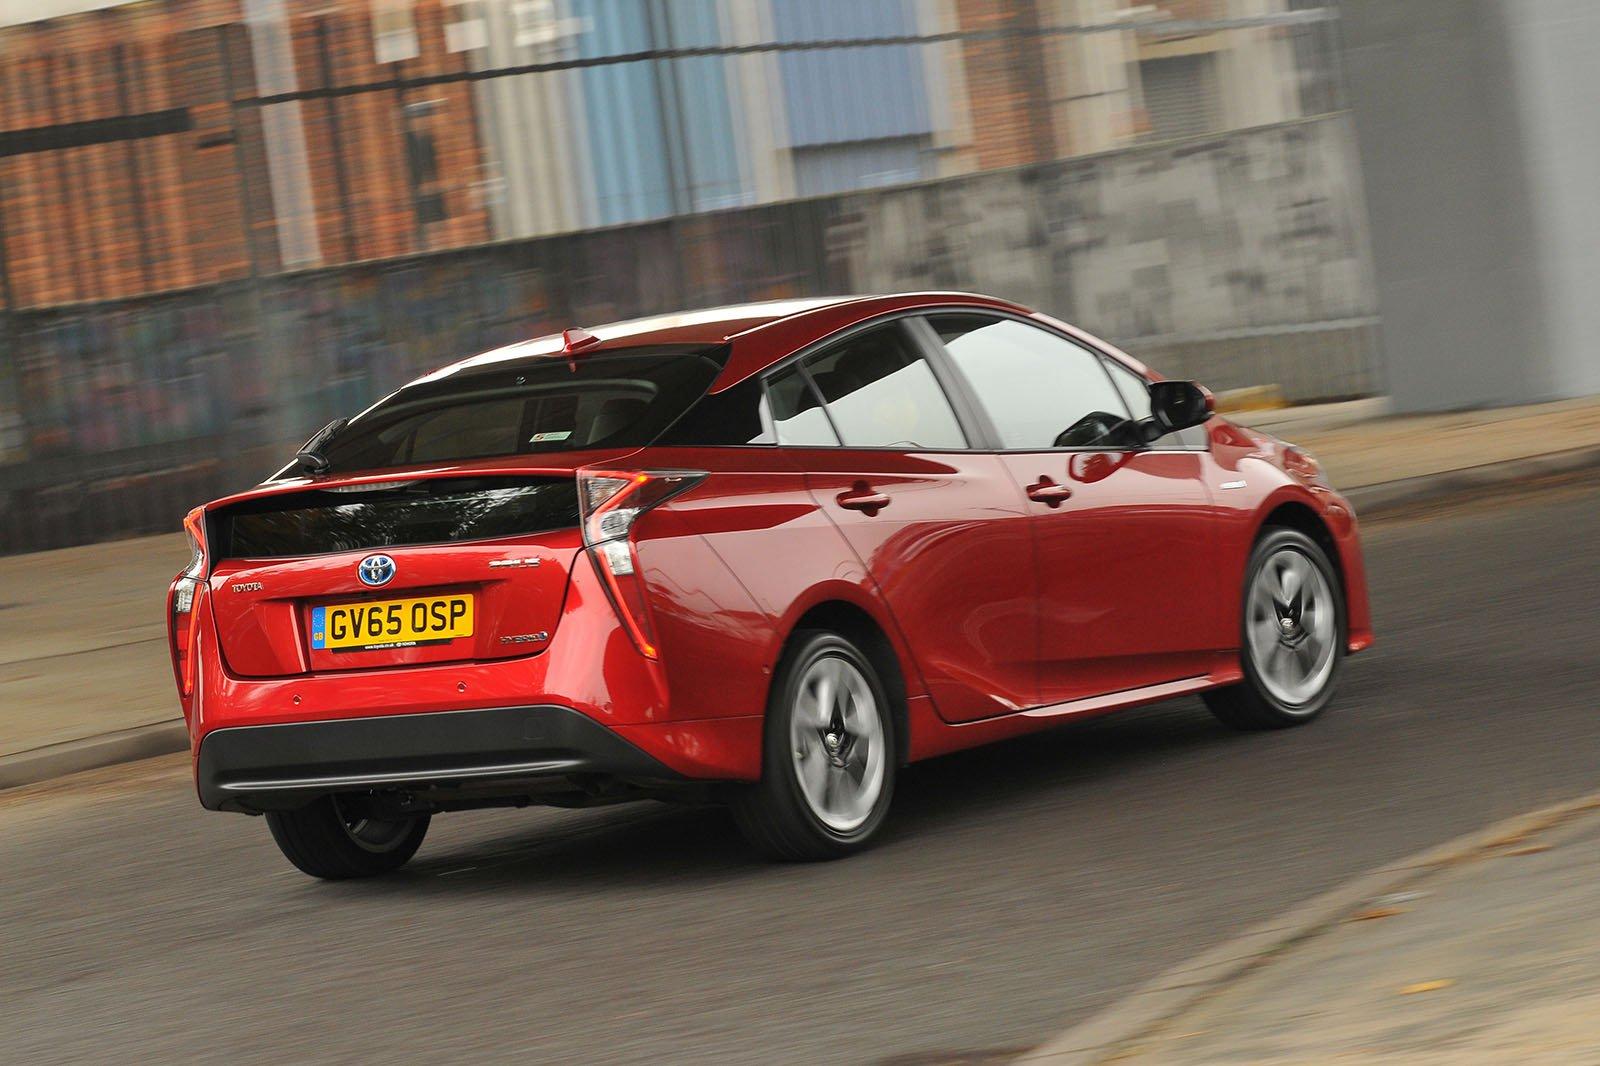 Used Toyota Prius rear